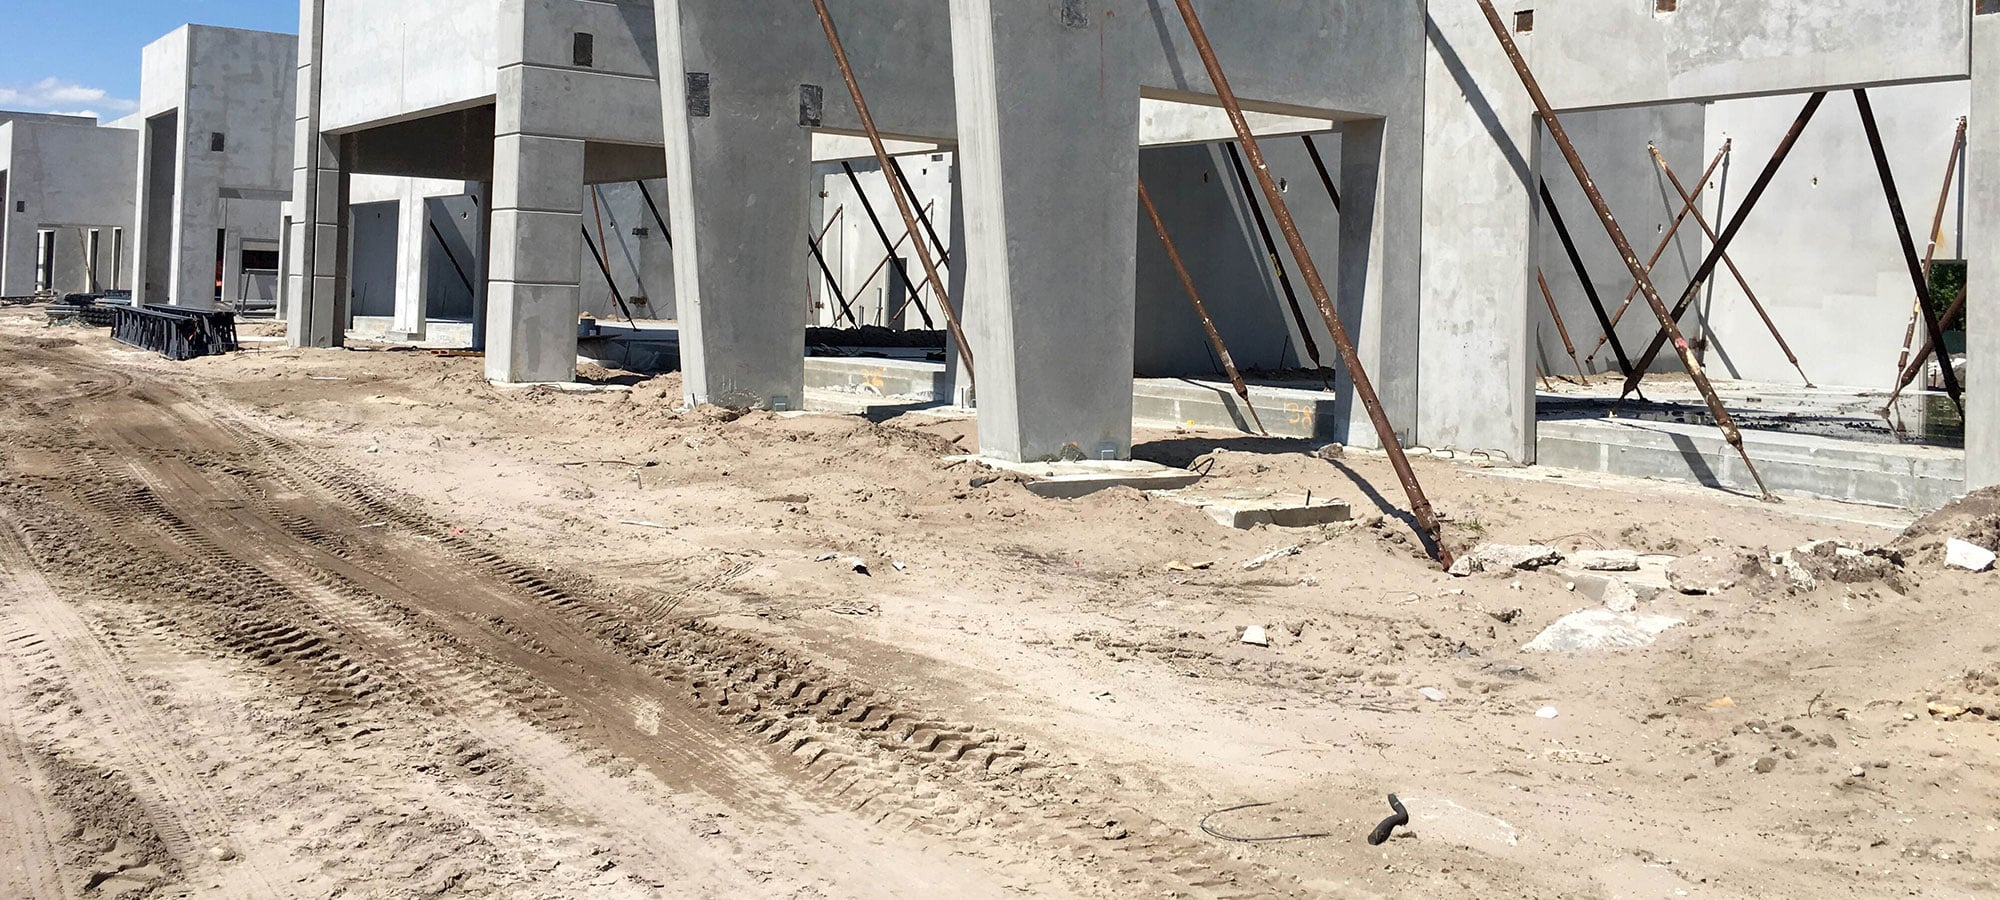 Diligent Termite Pretreatment For New Construction Commercial